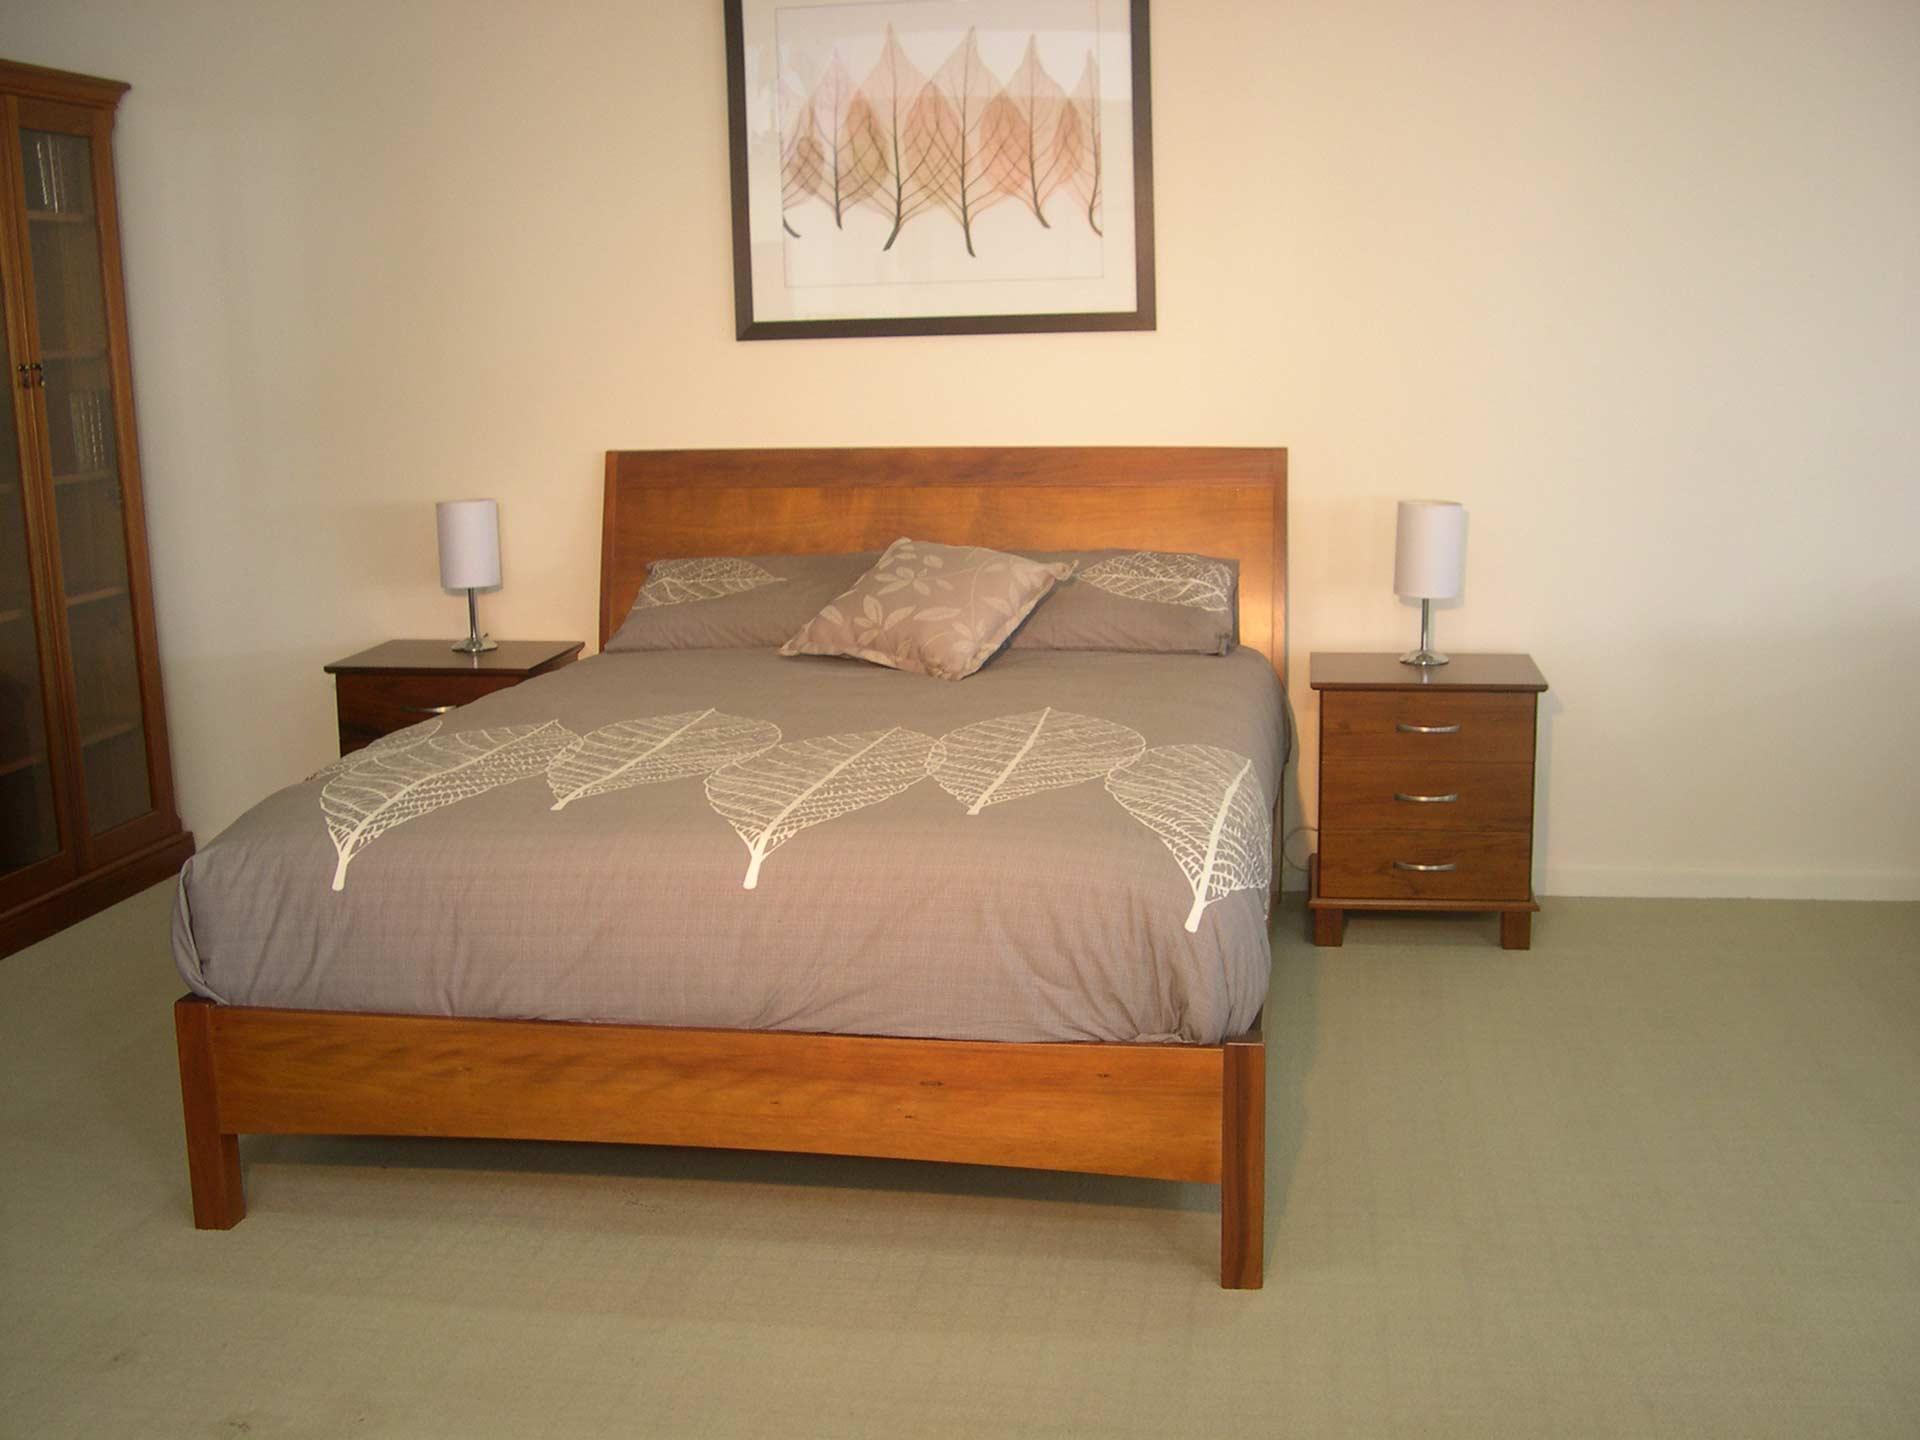 Bedroom Furniture Photo Gallery bedroom gallery - sears morton